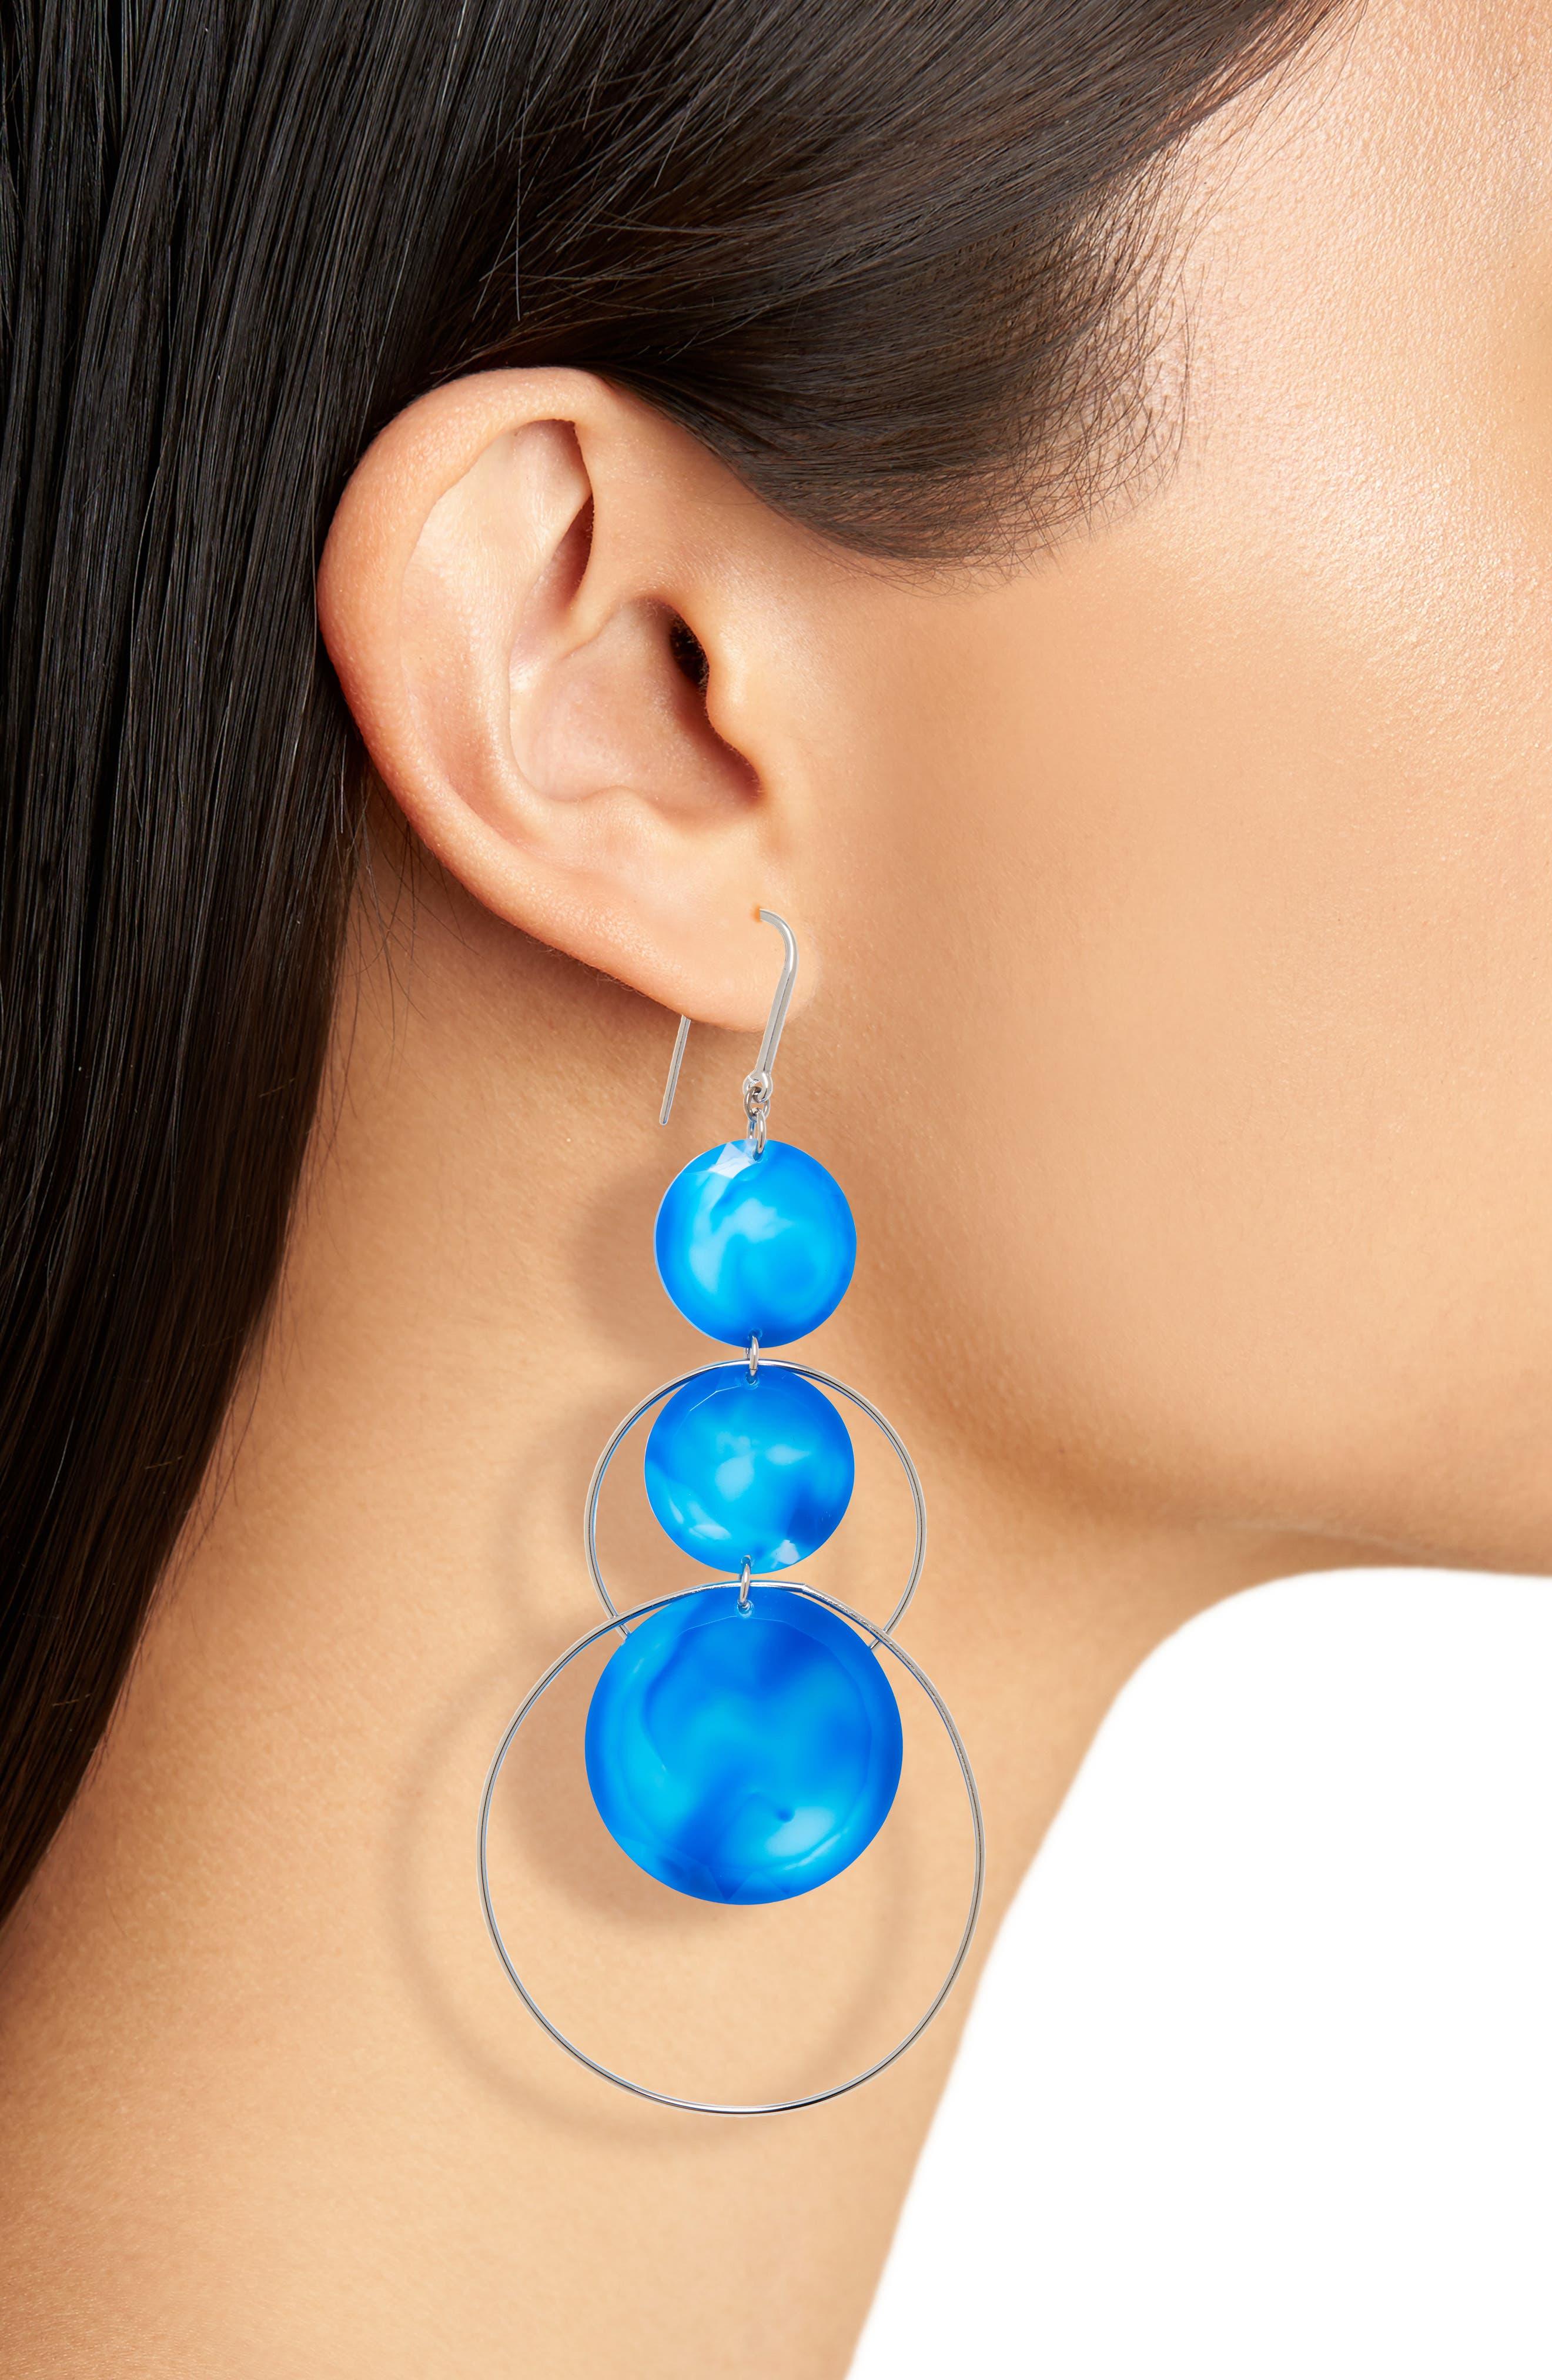 ISABEL MARANT, Harlem Circle Drop Earrings, Alternate thumbnail 2, color, BLUE